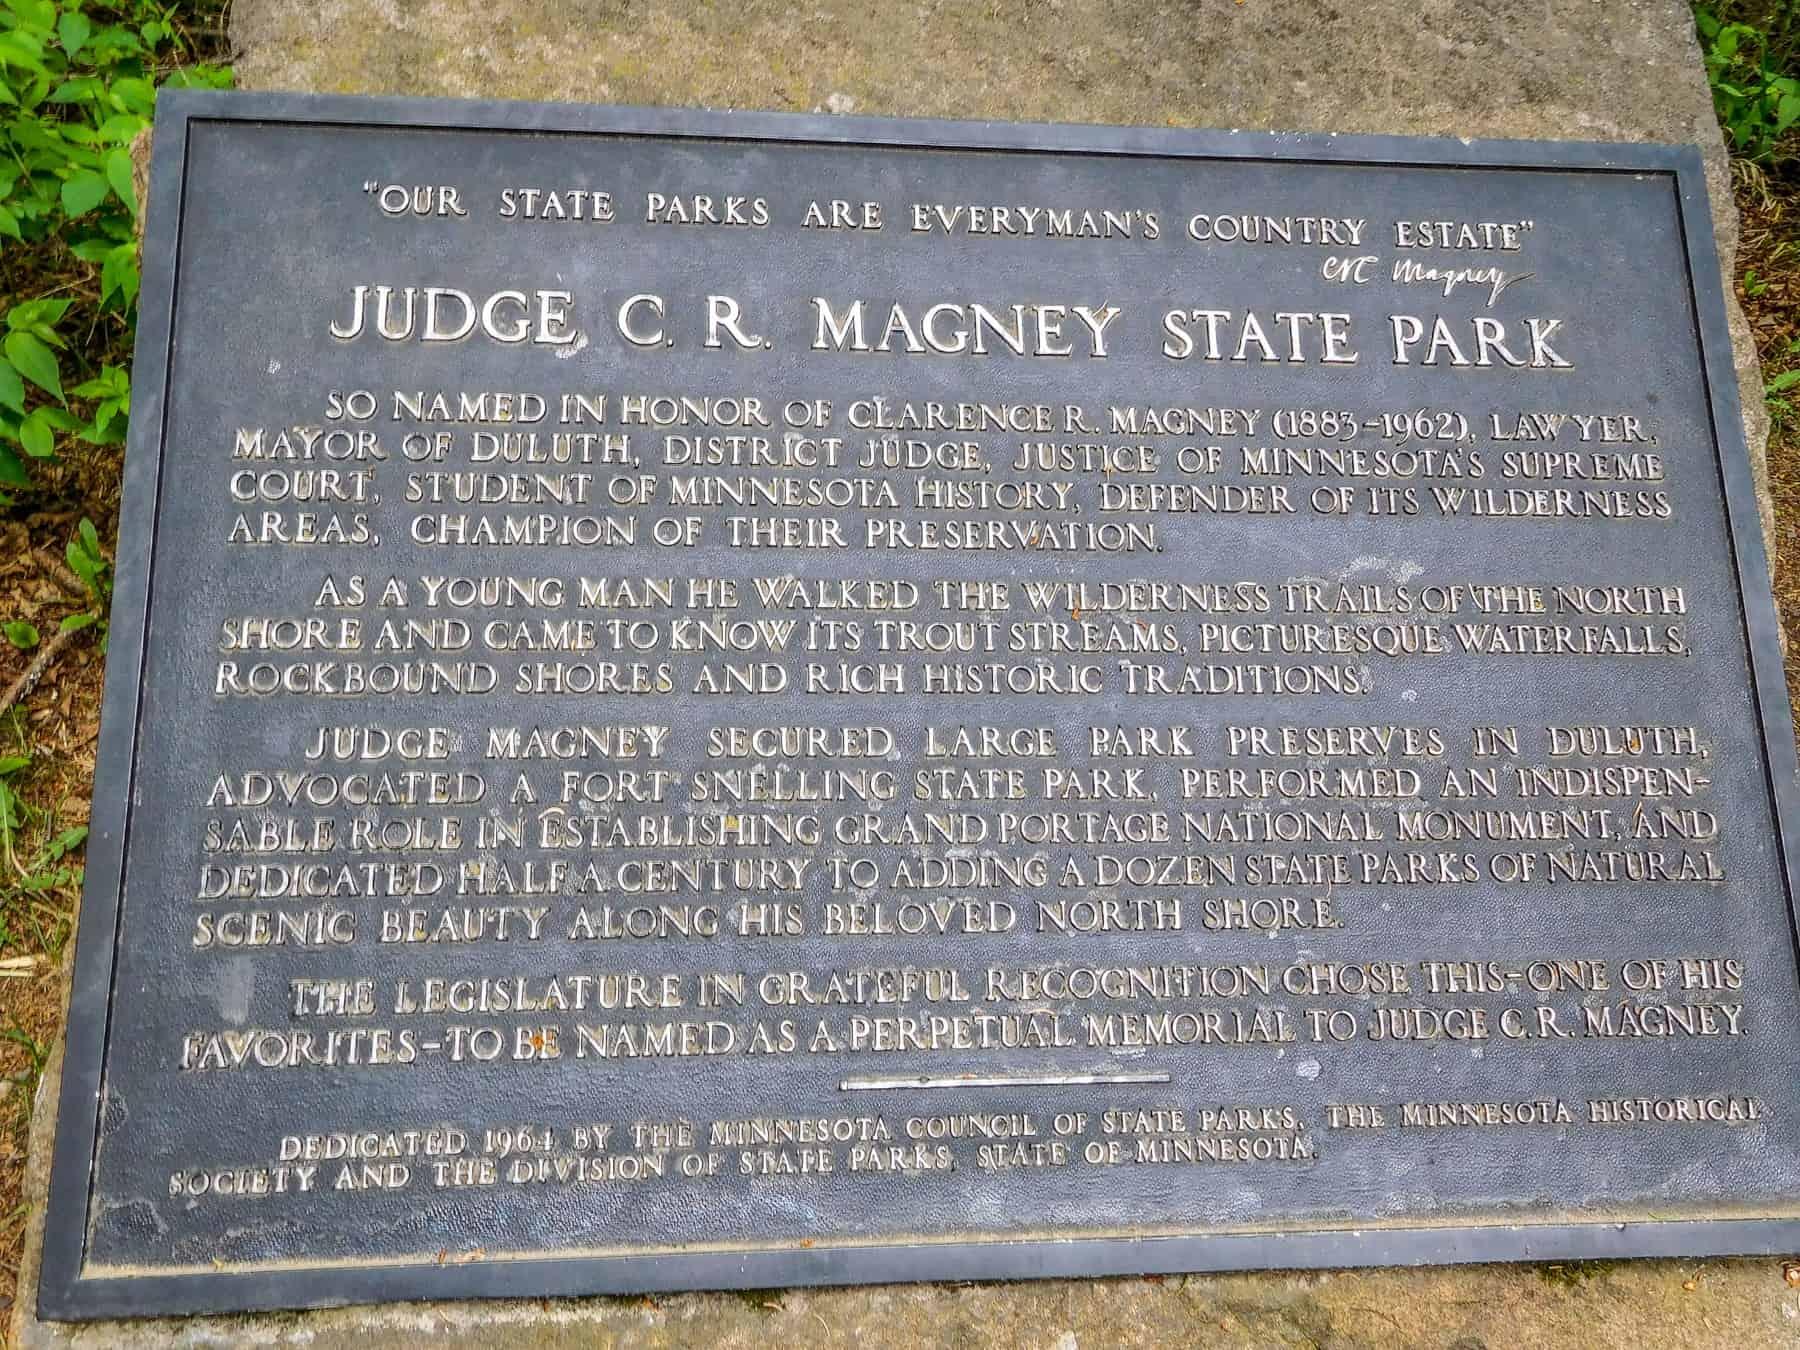 Judge CR Magney State Park park information plaque